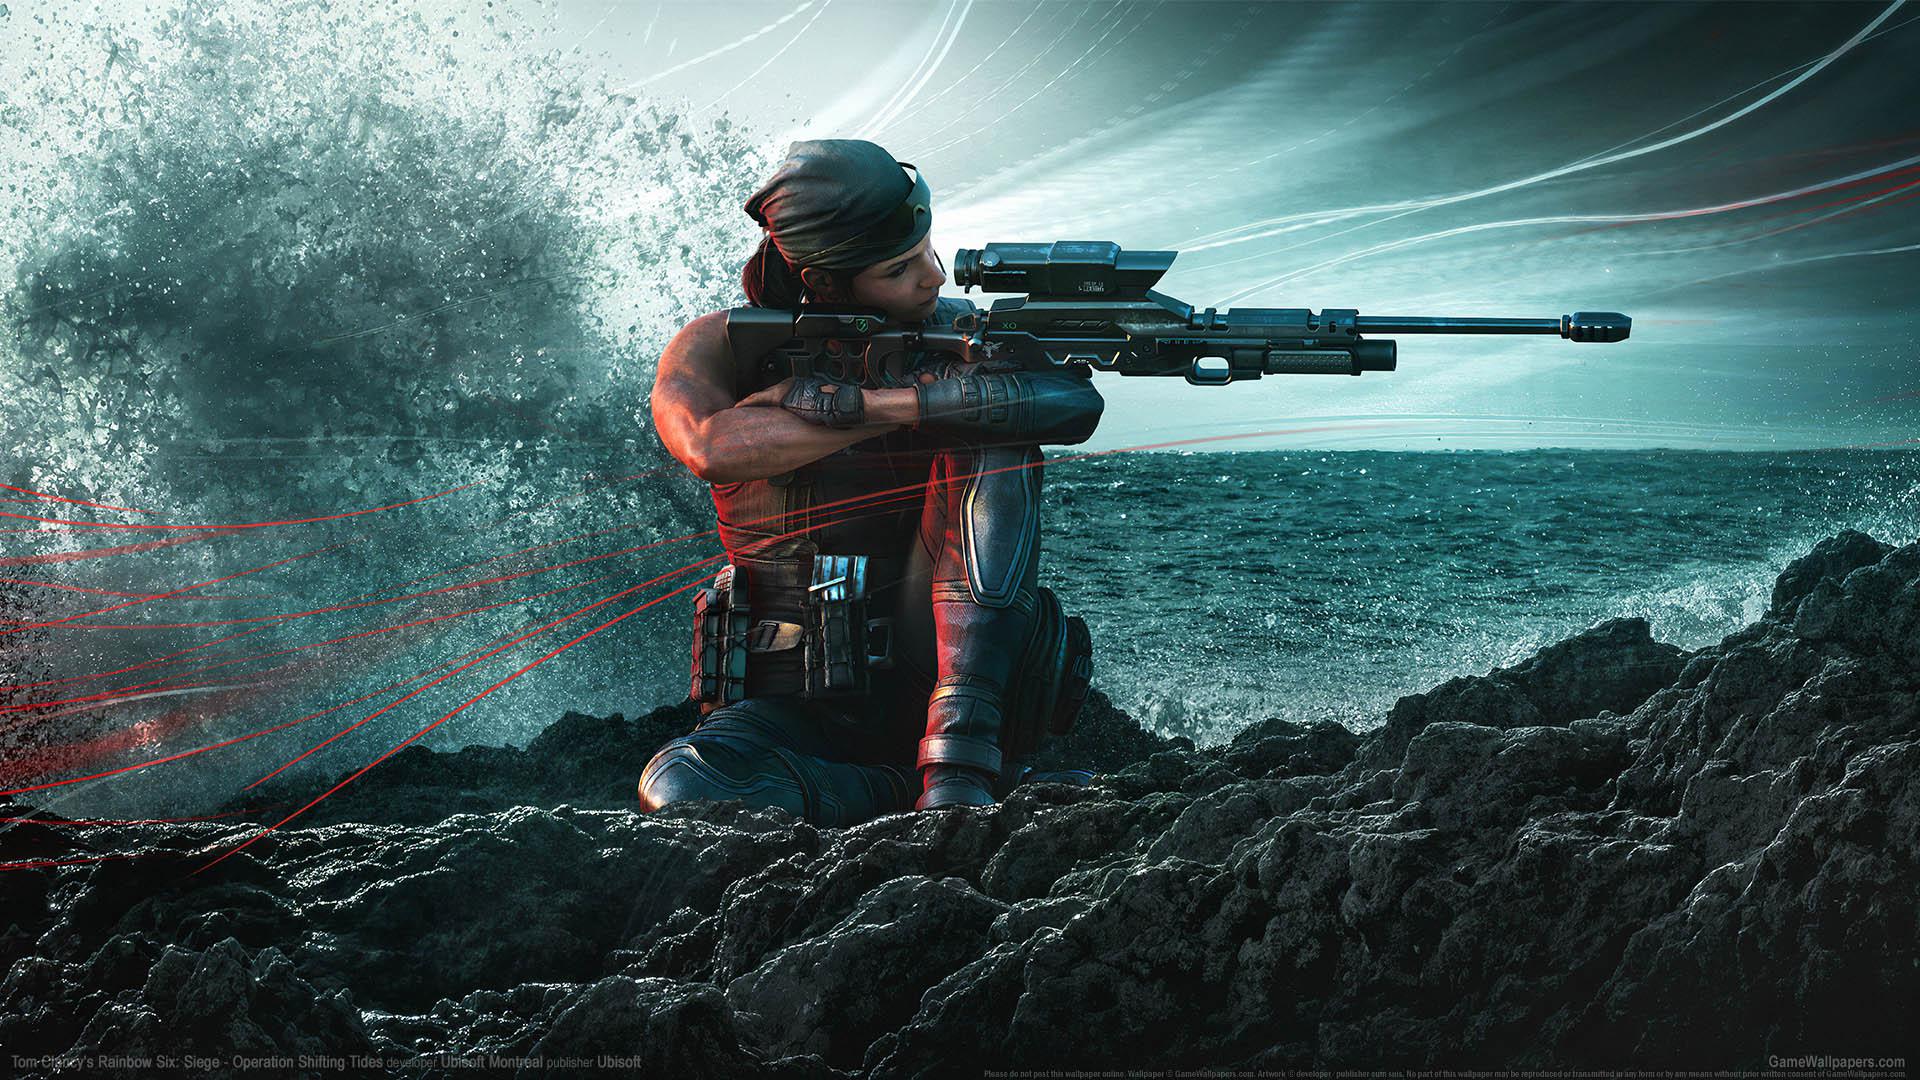 Tom Clancy's Rainbow Six: Siege - Operation Shifting Tides Hintergrundbild 01 1920x1080